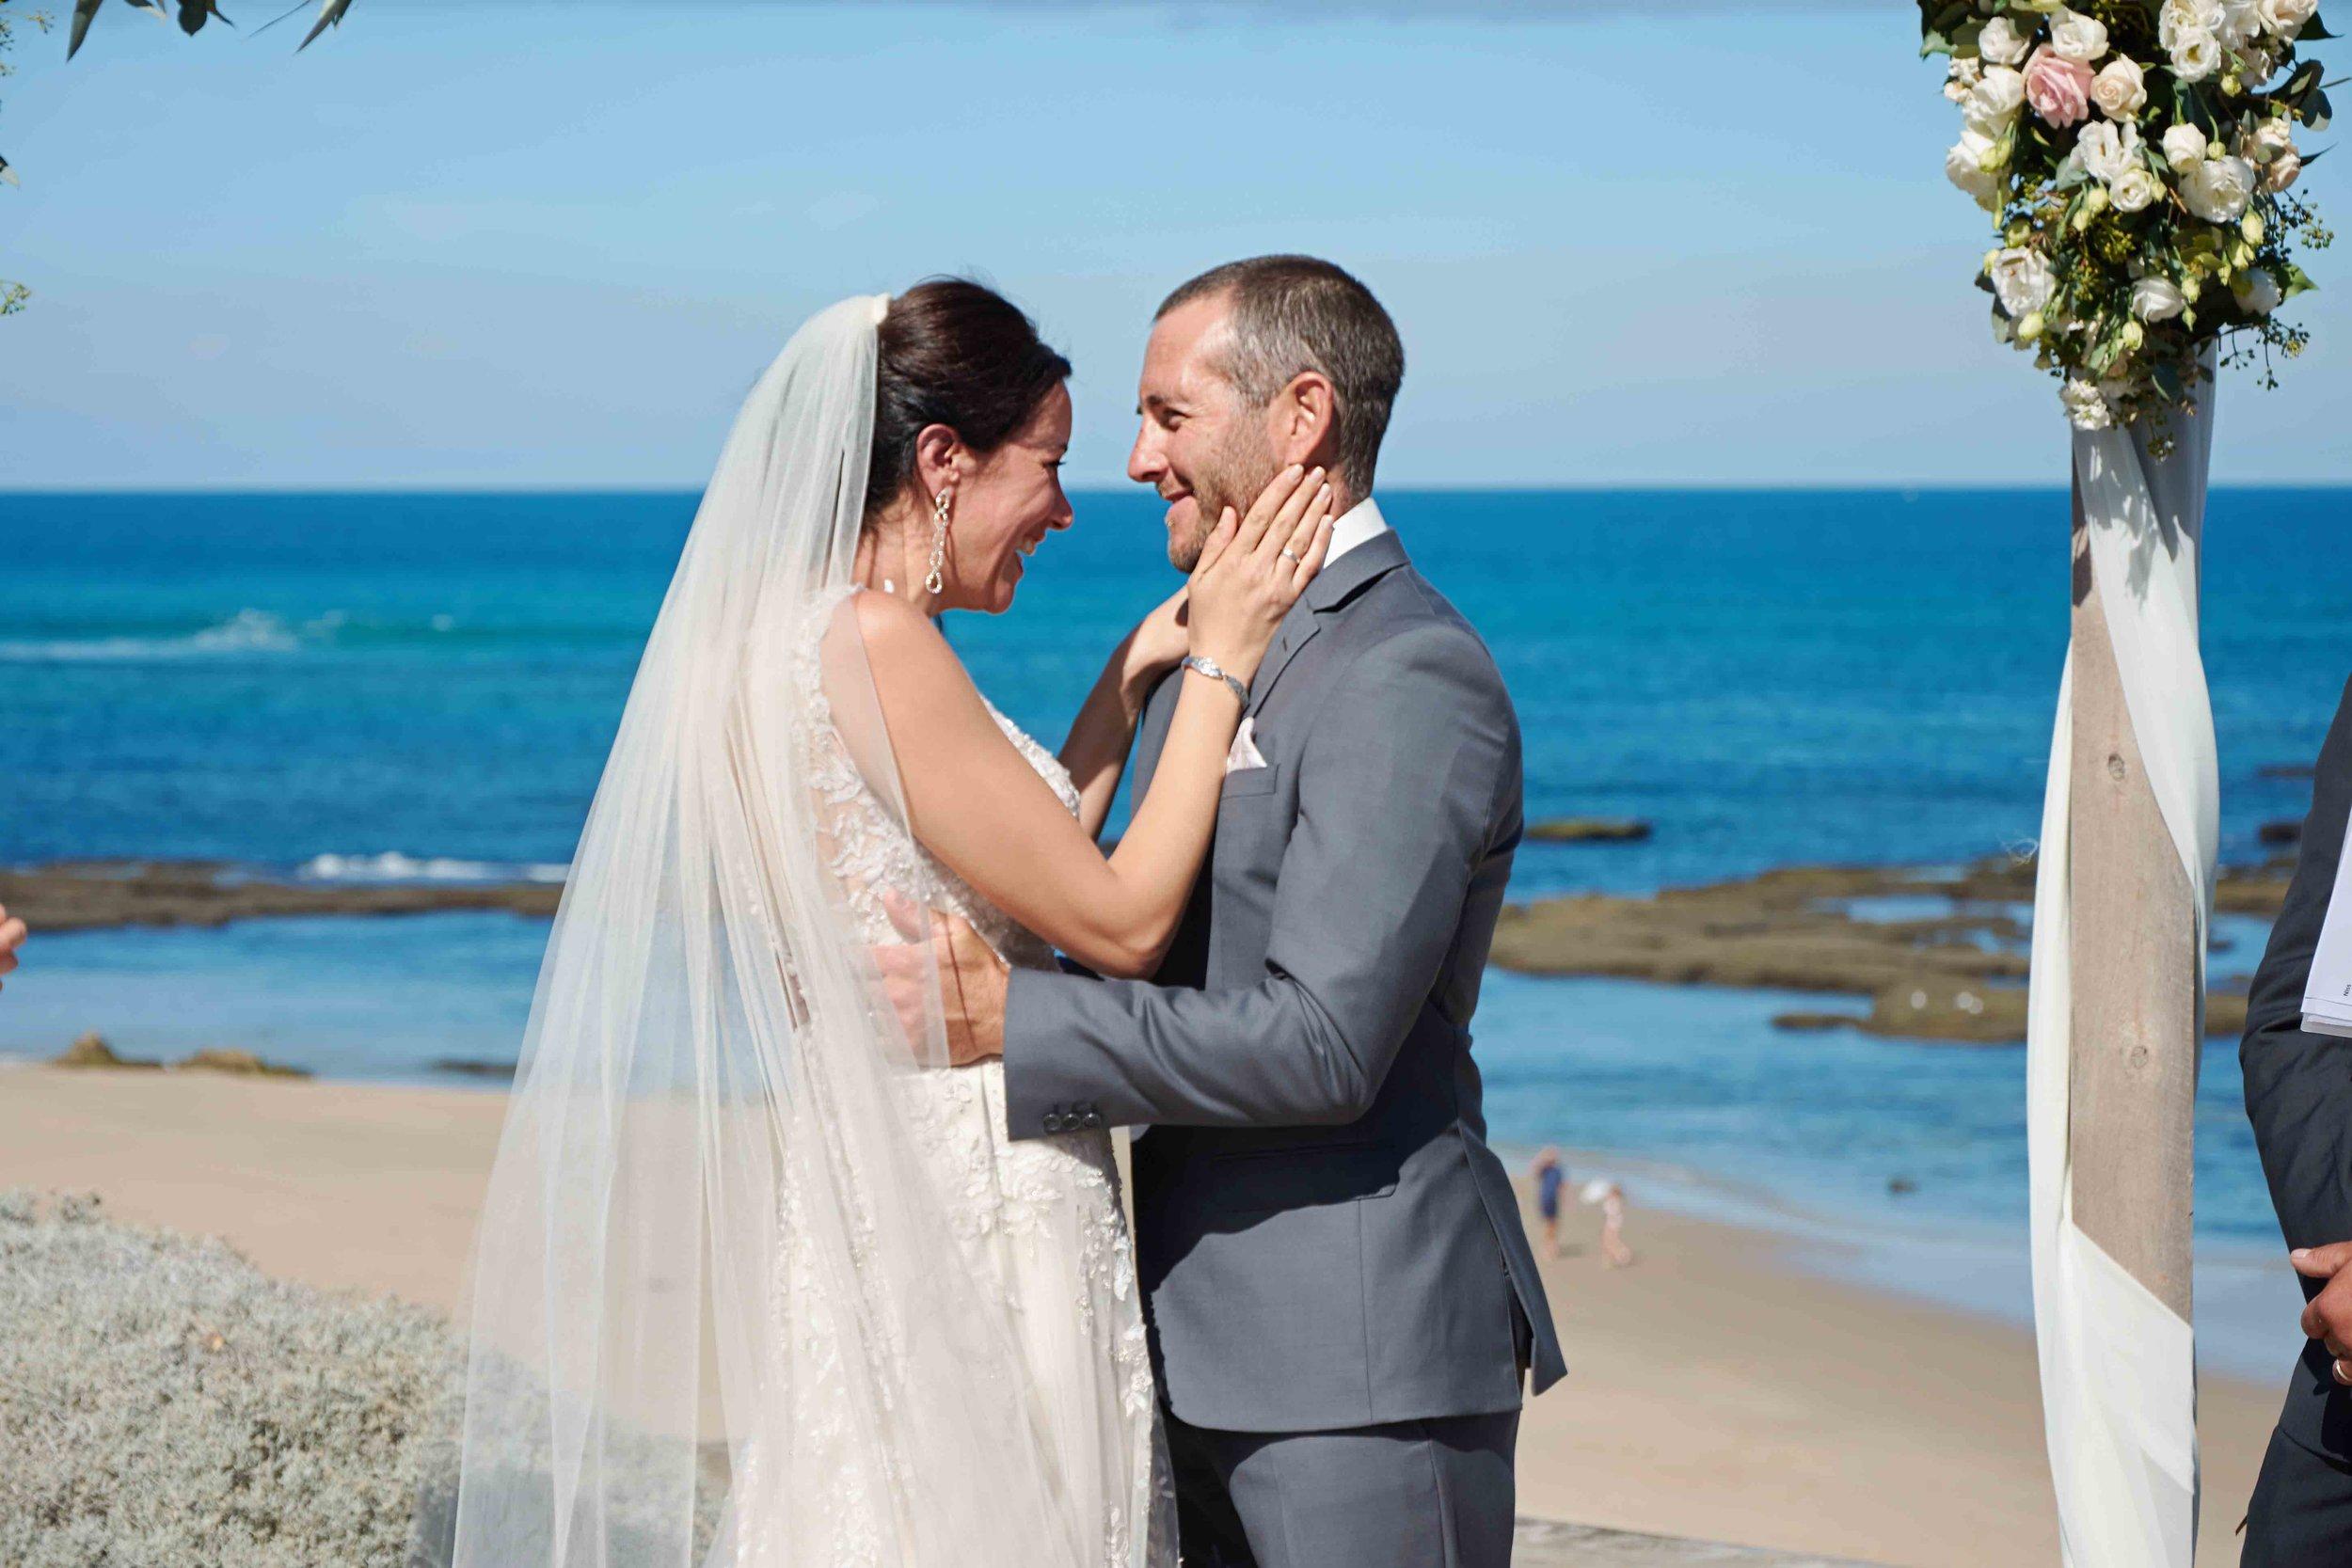 sorrento-wedding-photography-all-smiles-marissa-jade-photography-58.jpg